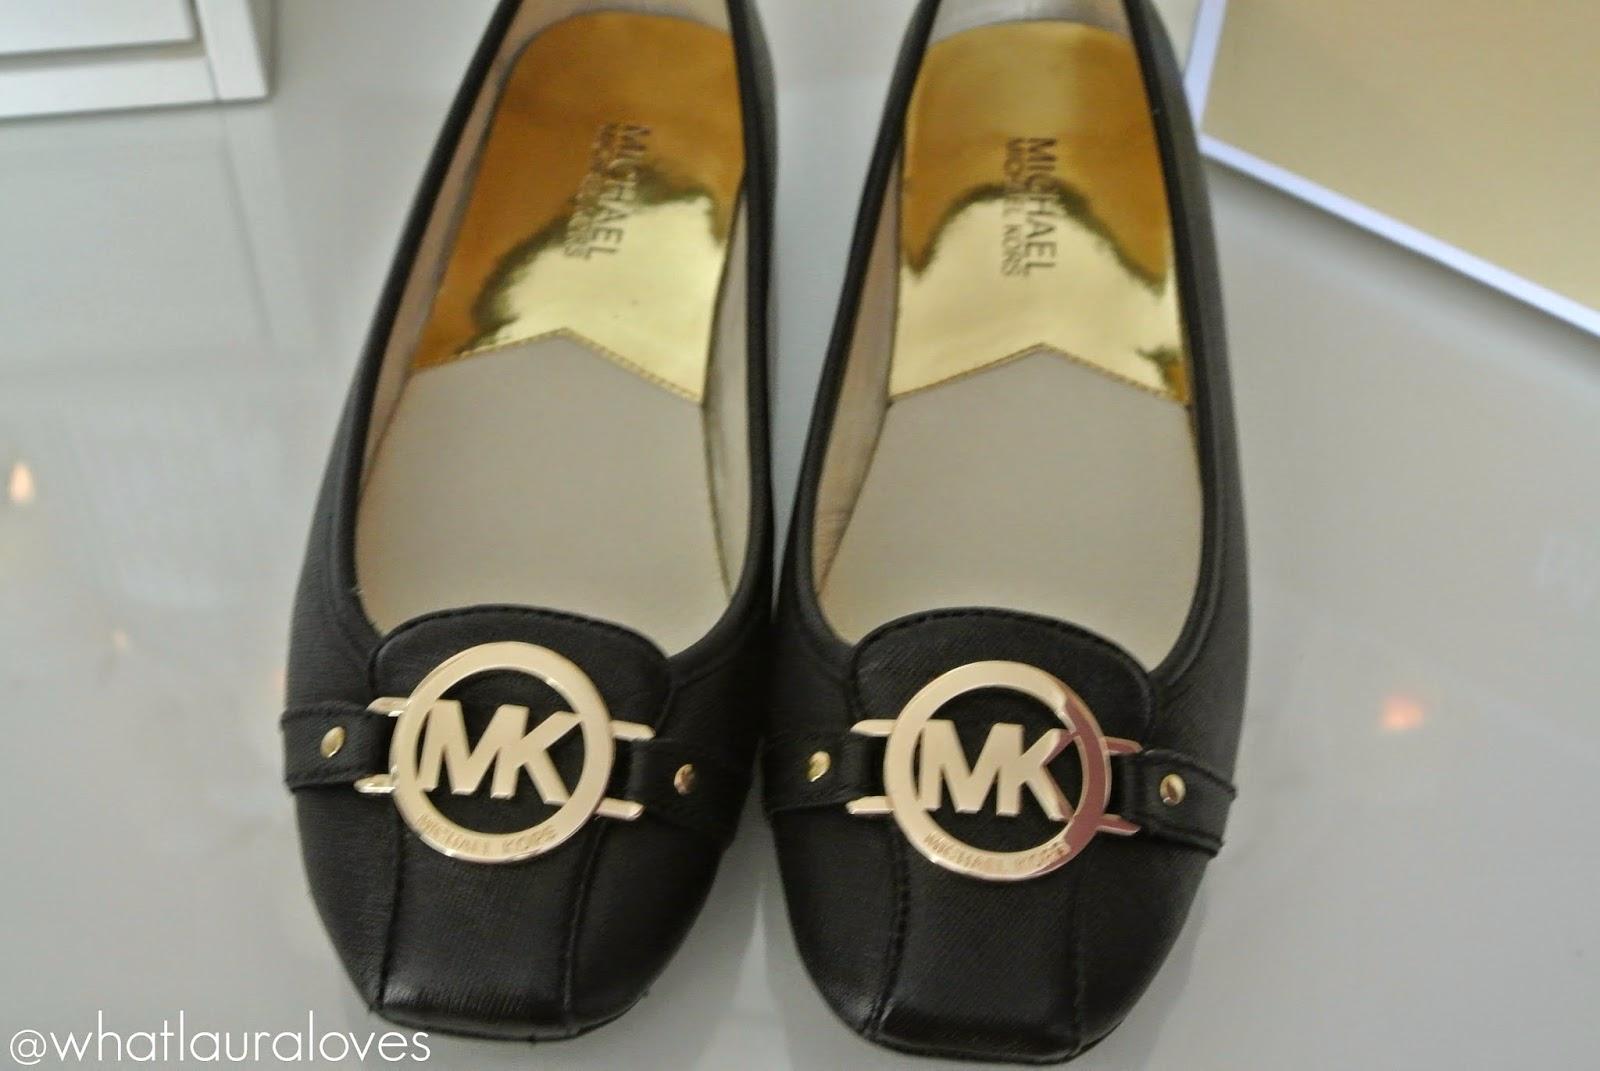 646b9edbfe34 Buy michael kors com shoes   OFF63% Discounted